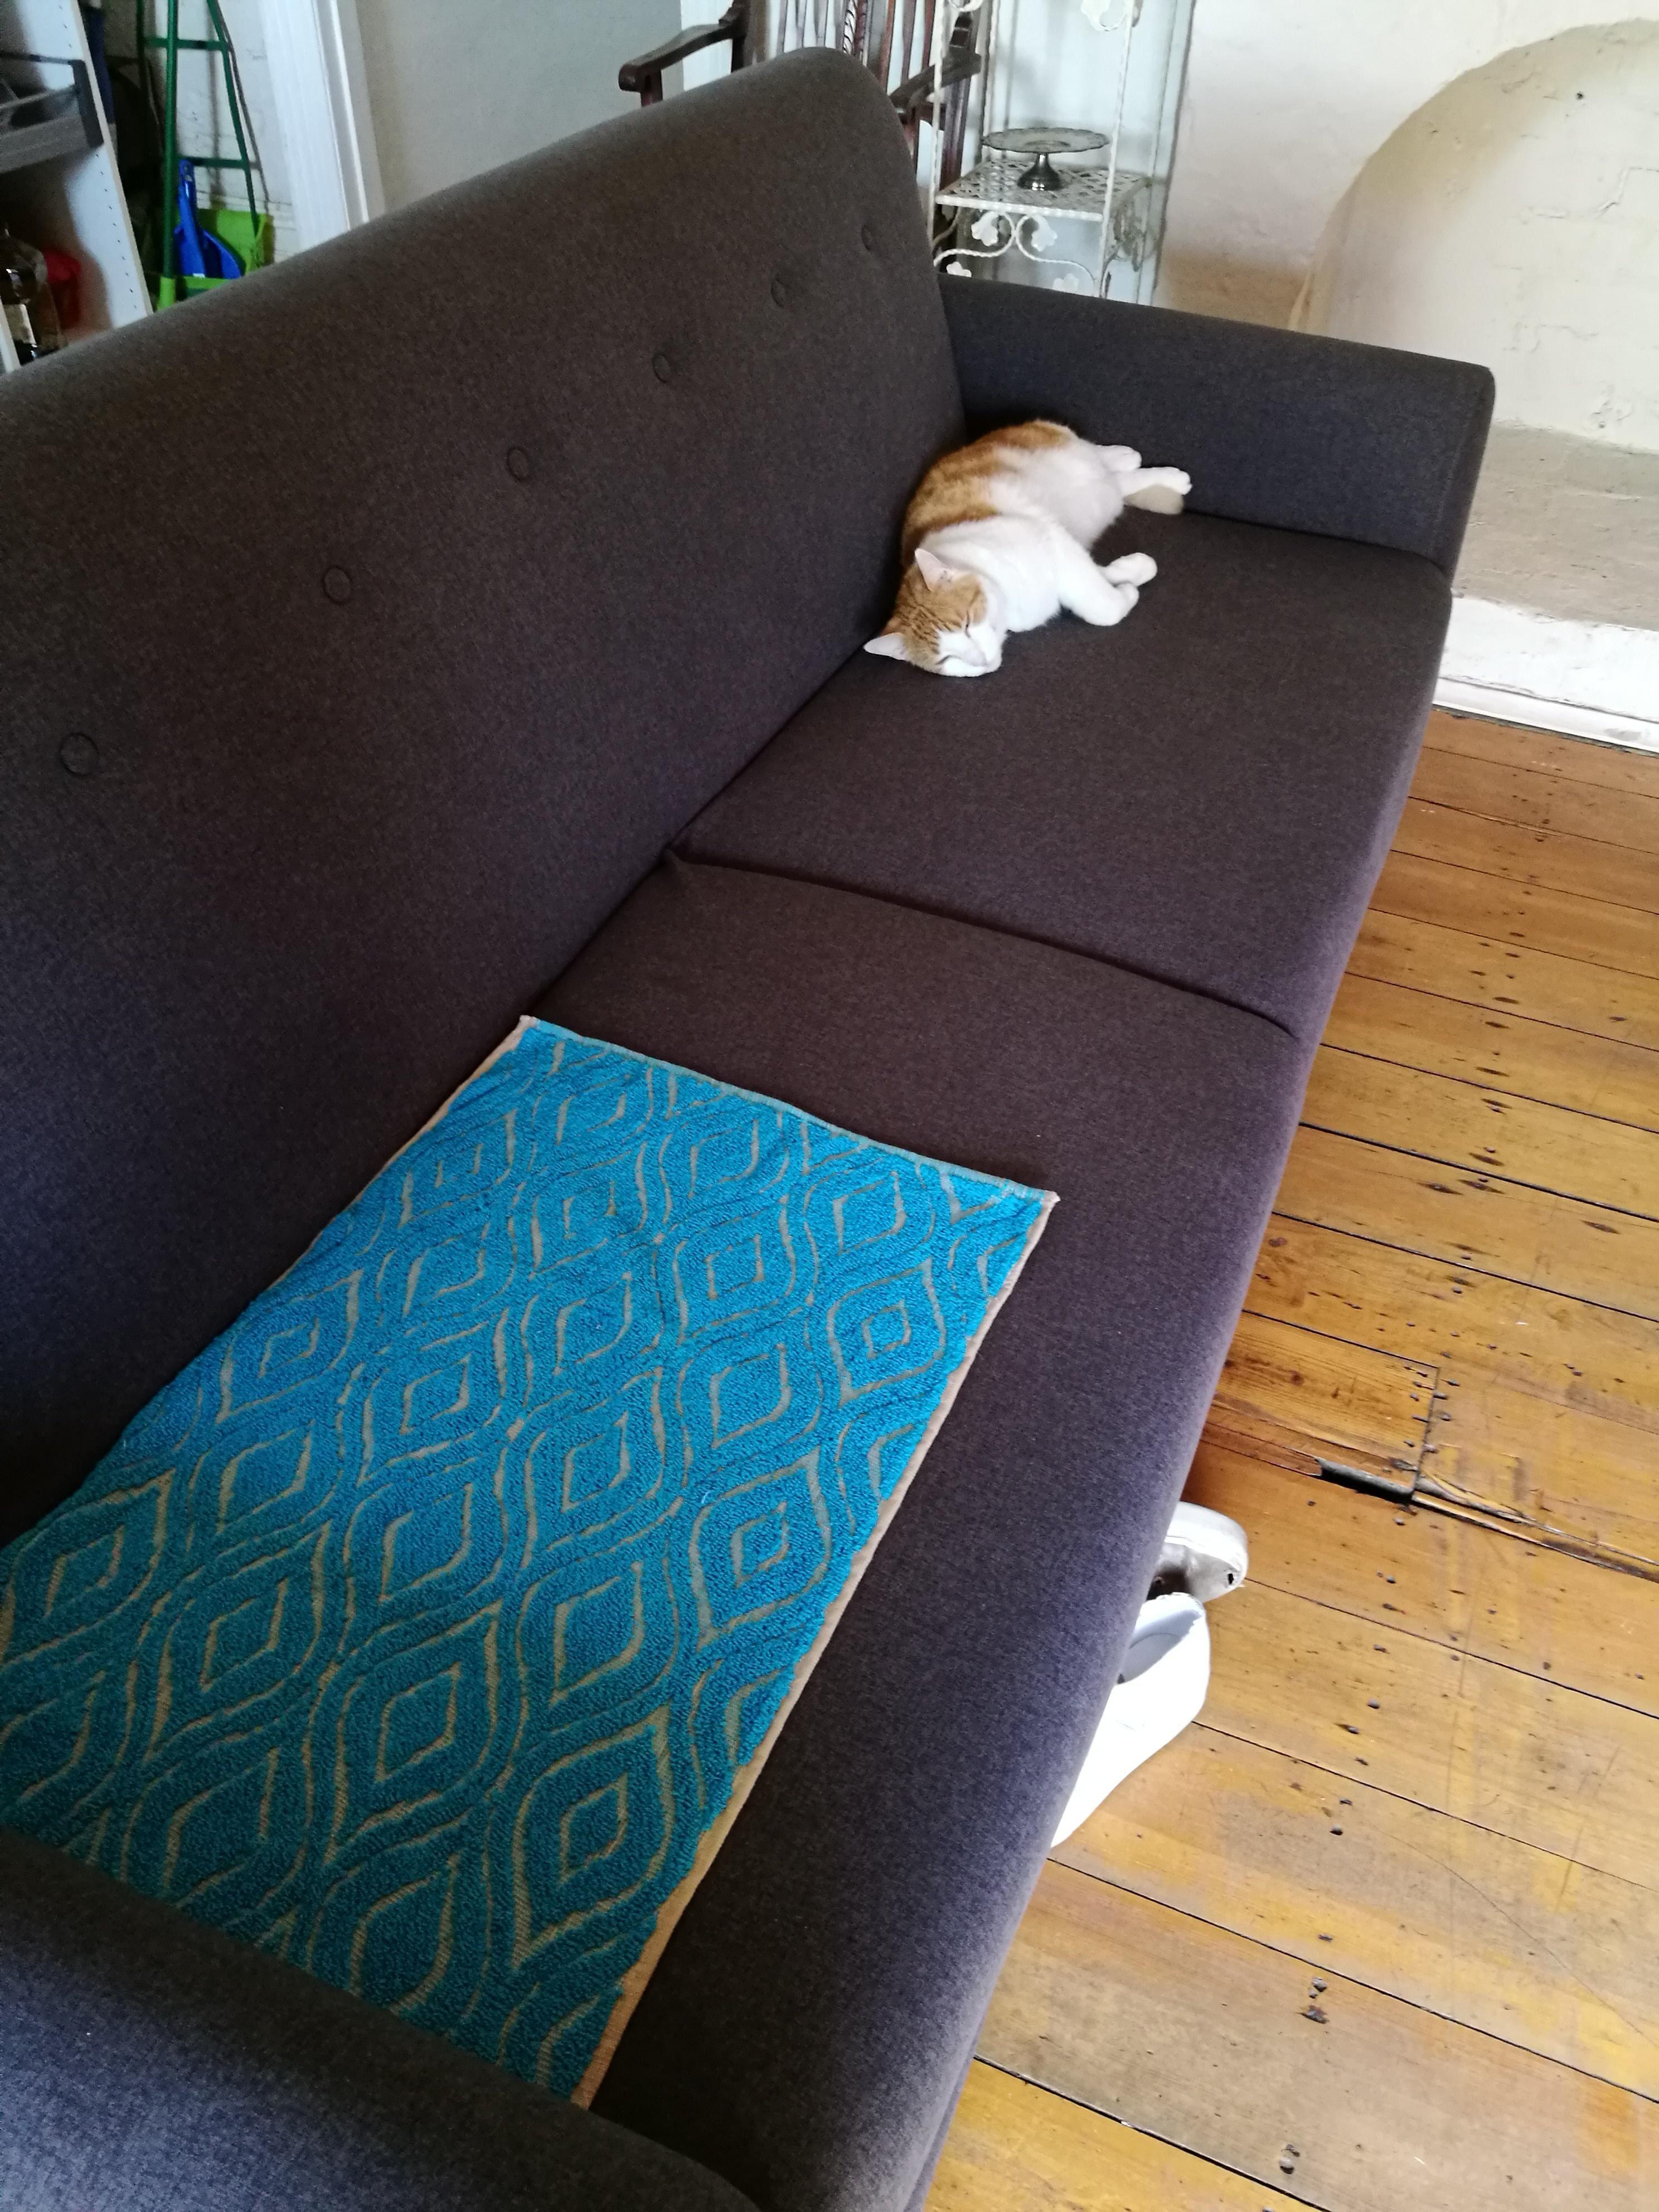 Put him to sofa